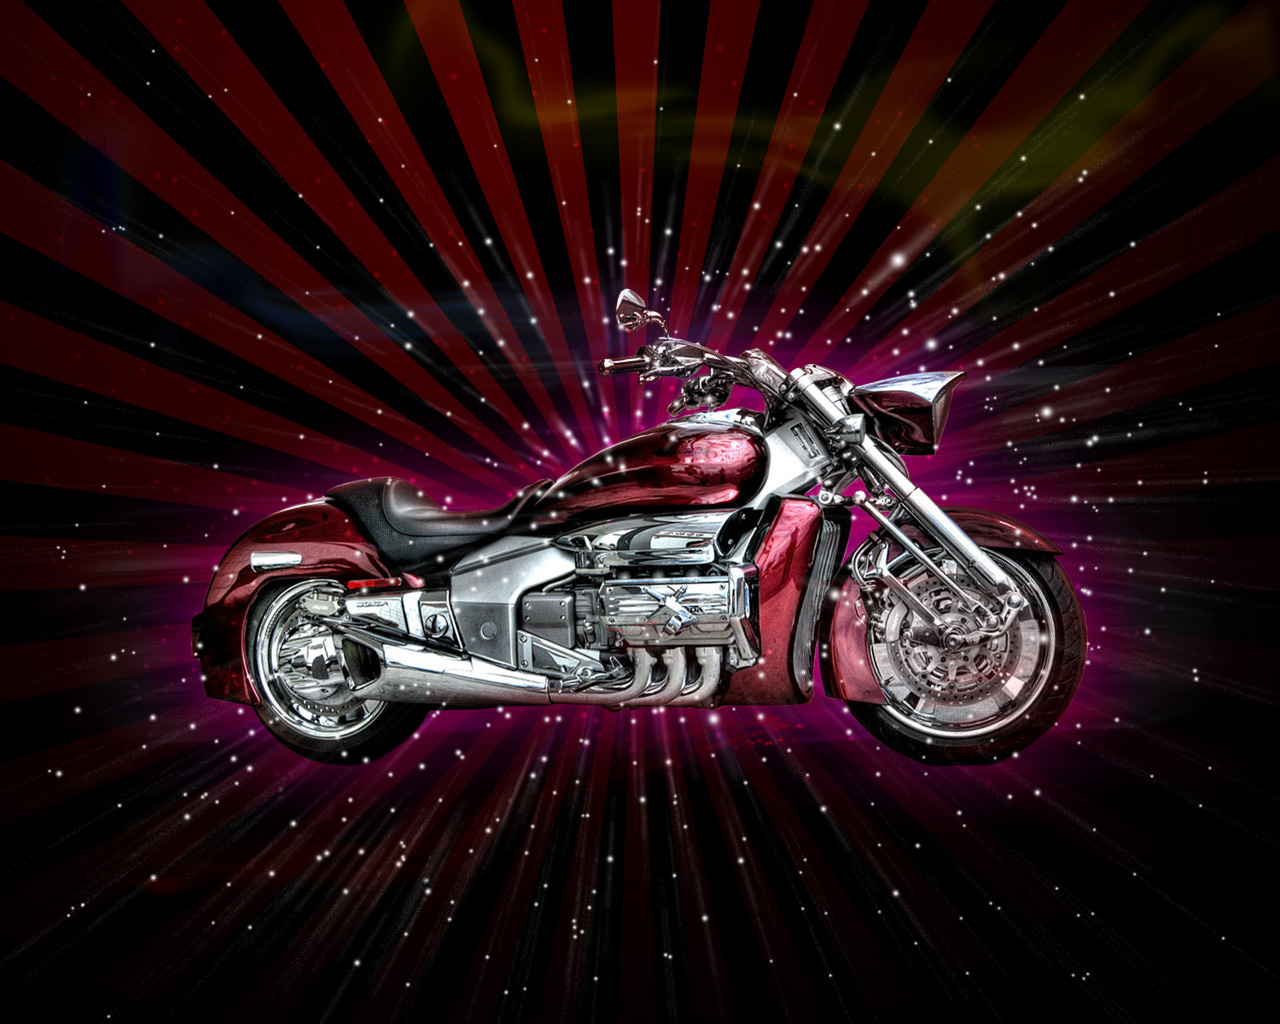 http://2.bp.blogspot.com/-hzkG-9yATvk/Tx746VS1IiI/AAAAAAAAMfo/3sn1oN1u2rA/s1600/dlya_elfika_harley-davidson-motorcycle-wallpaper.jpg